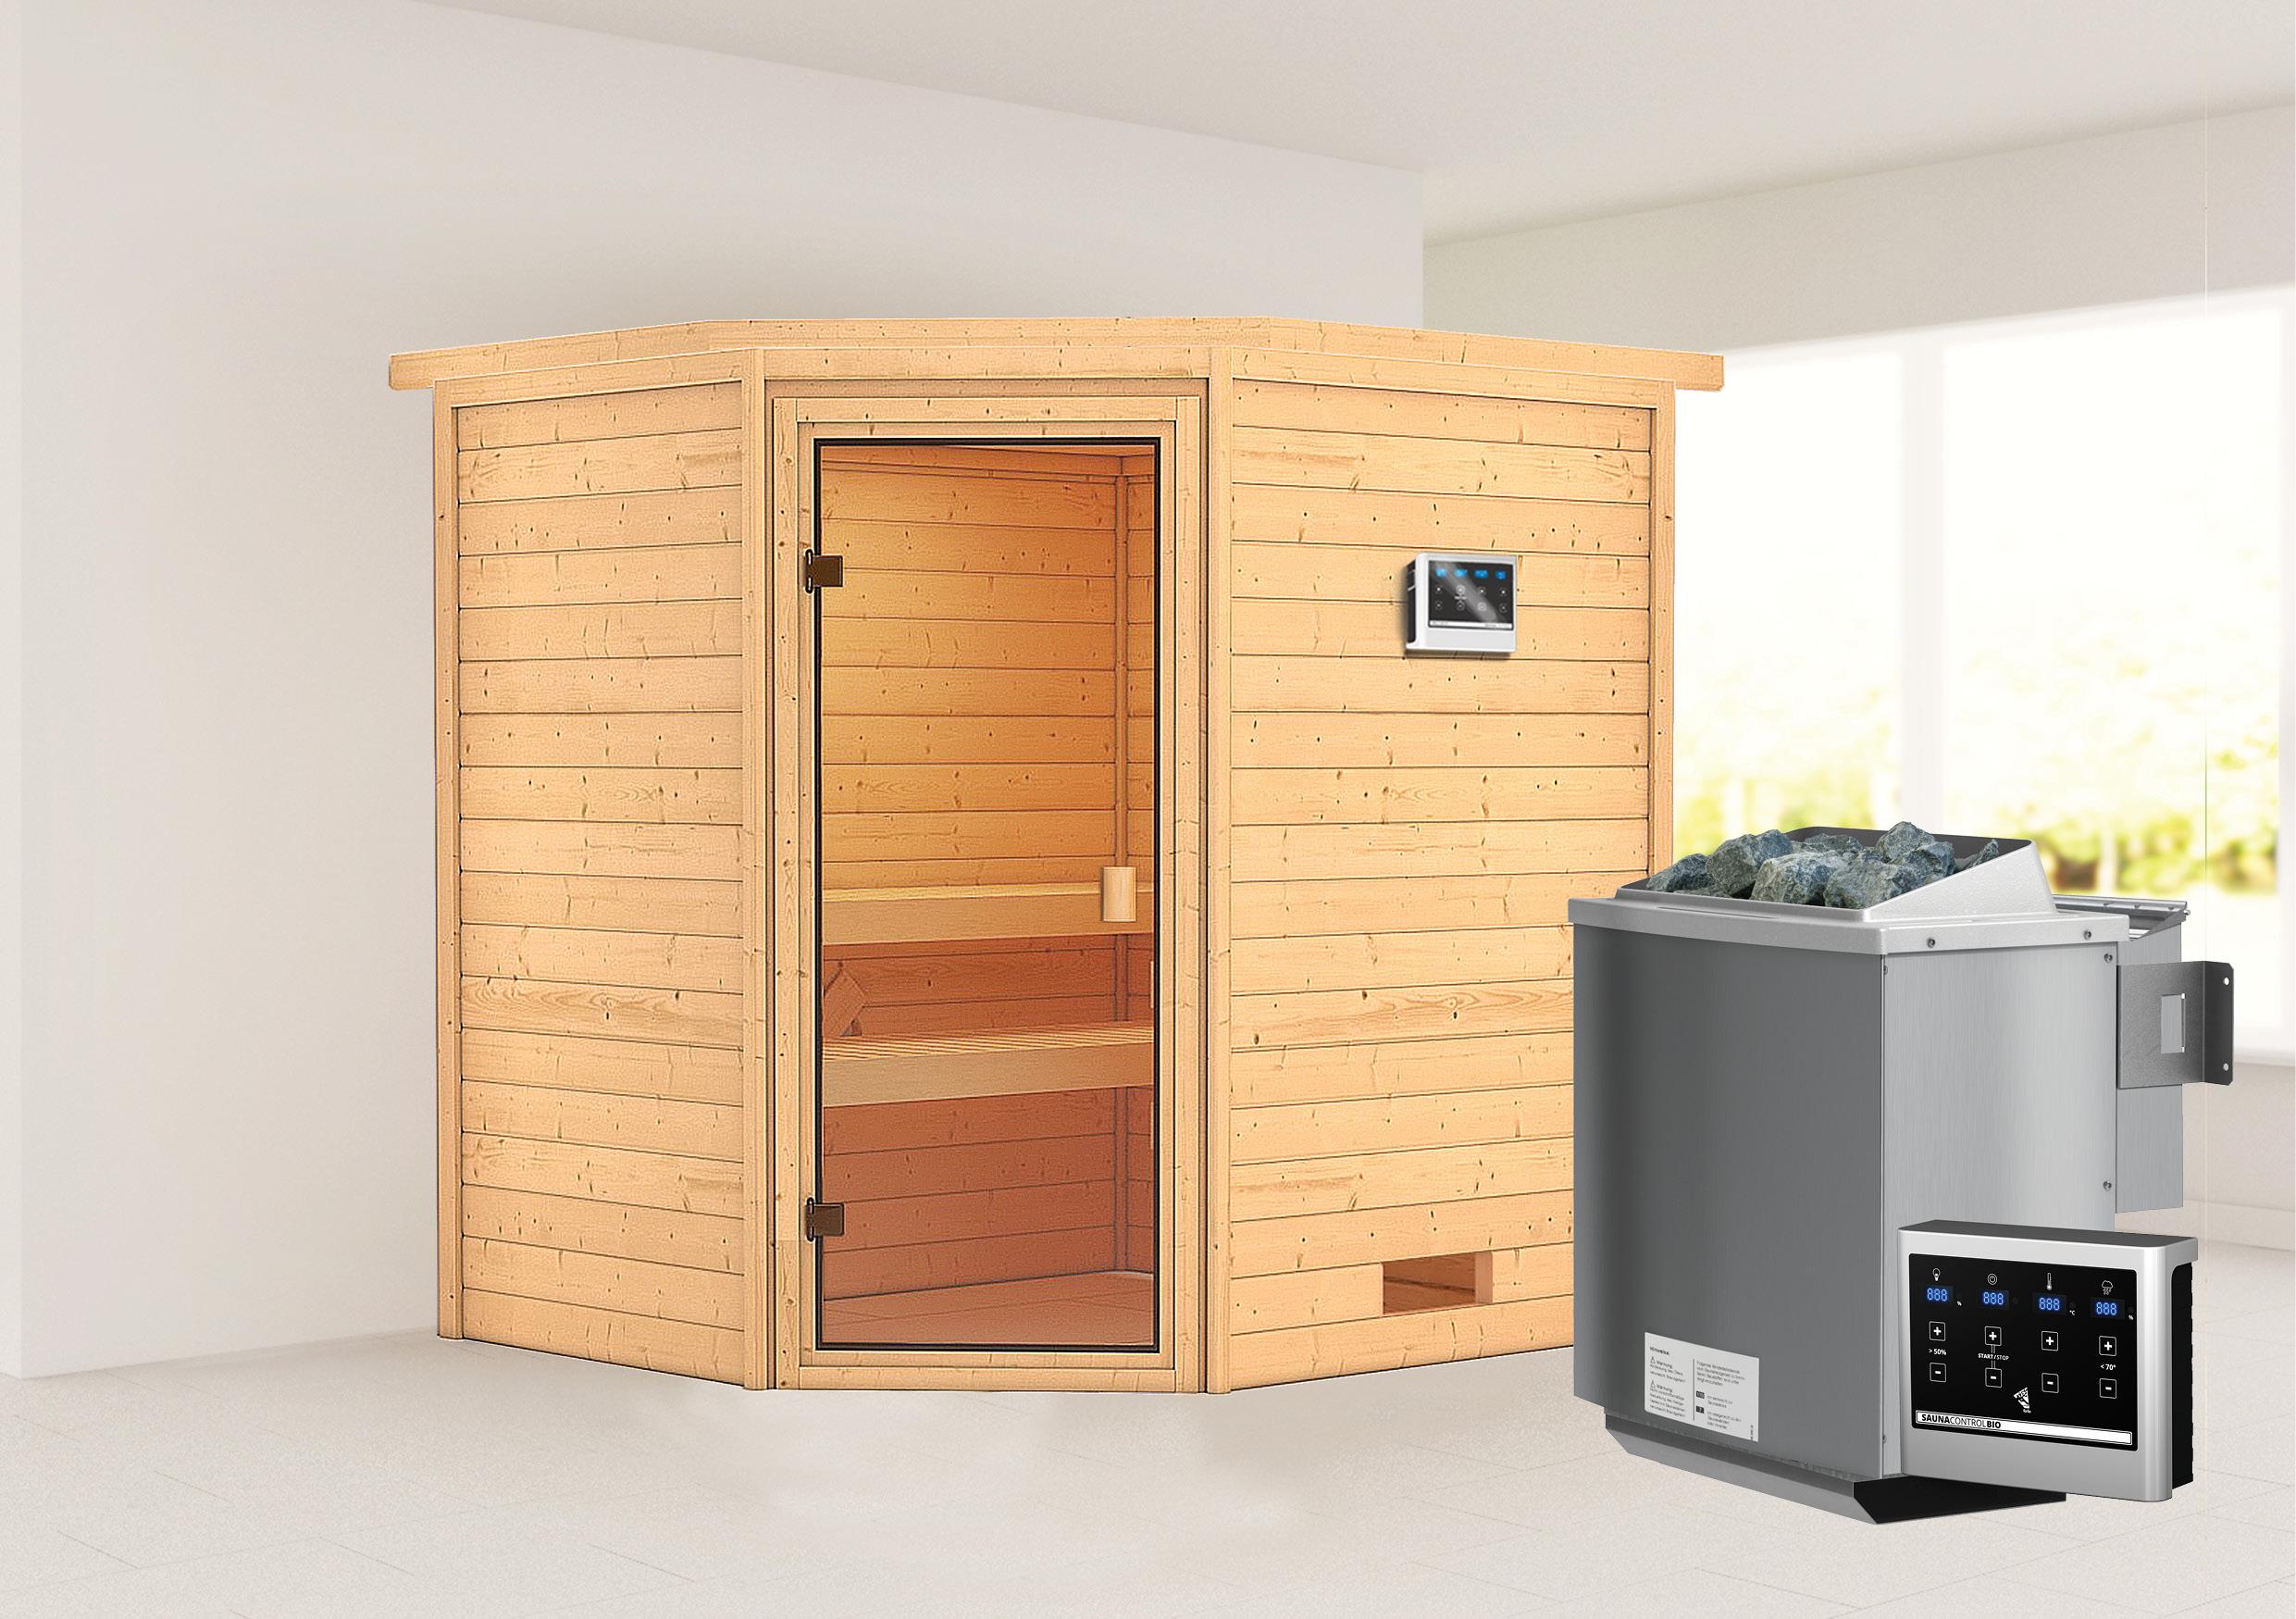 Woodfeeling Sauna Elea 38mm Bio Saunaofen 9kW extern Bild 1